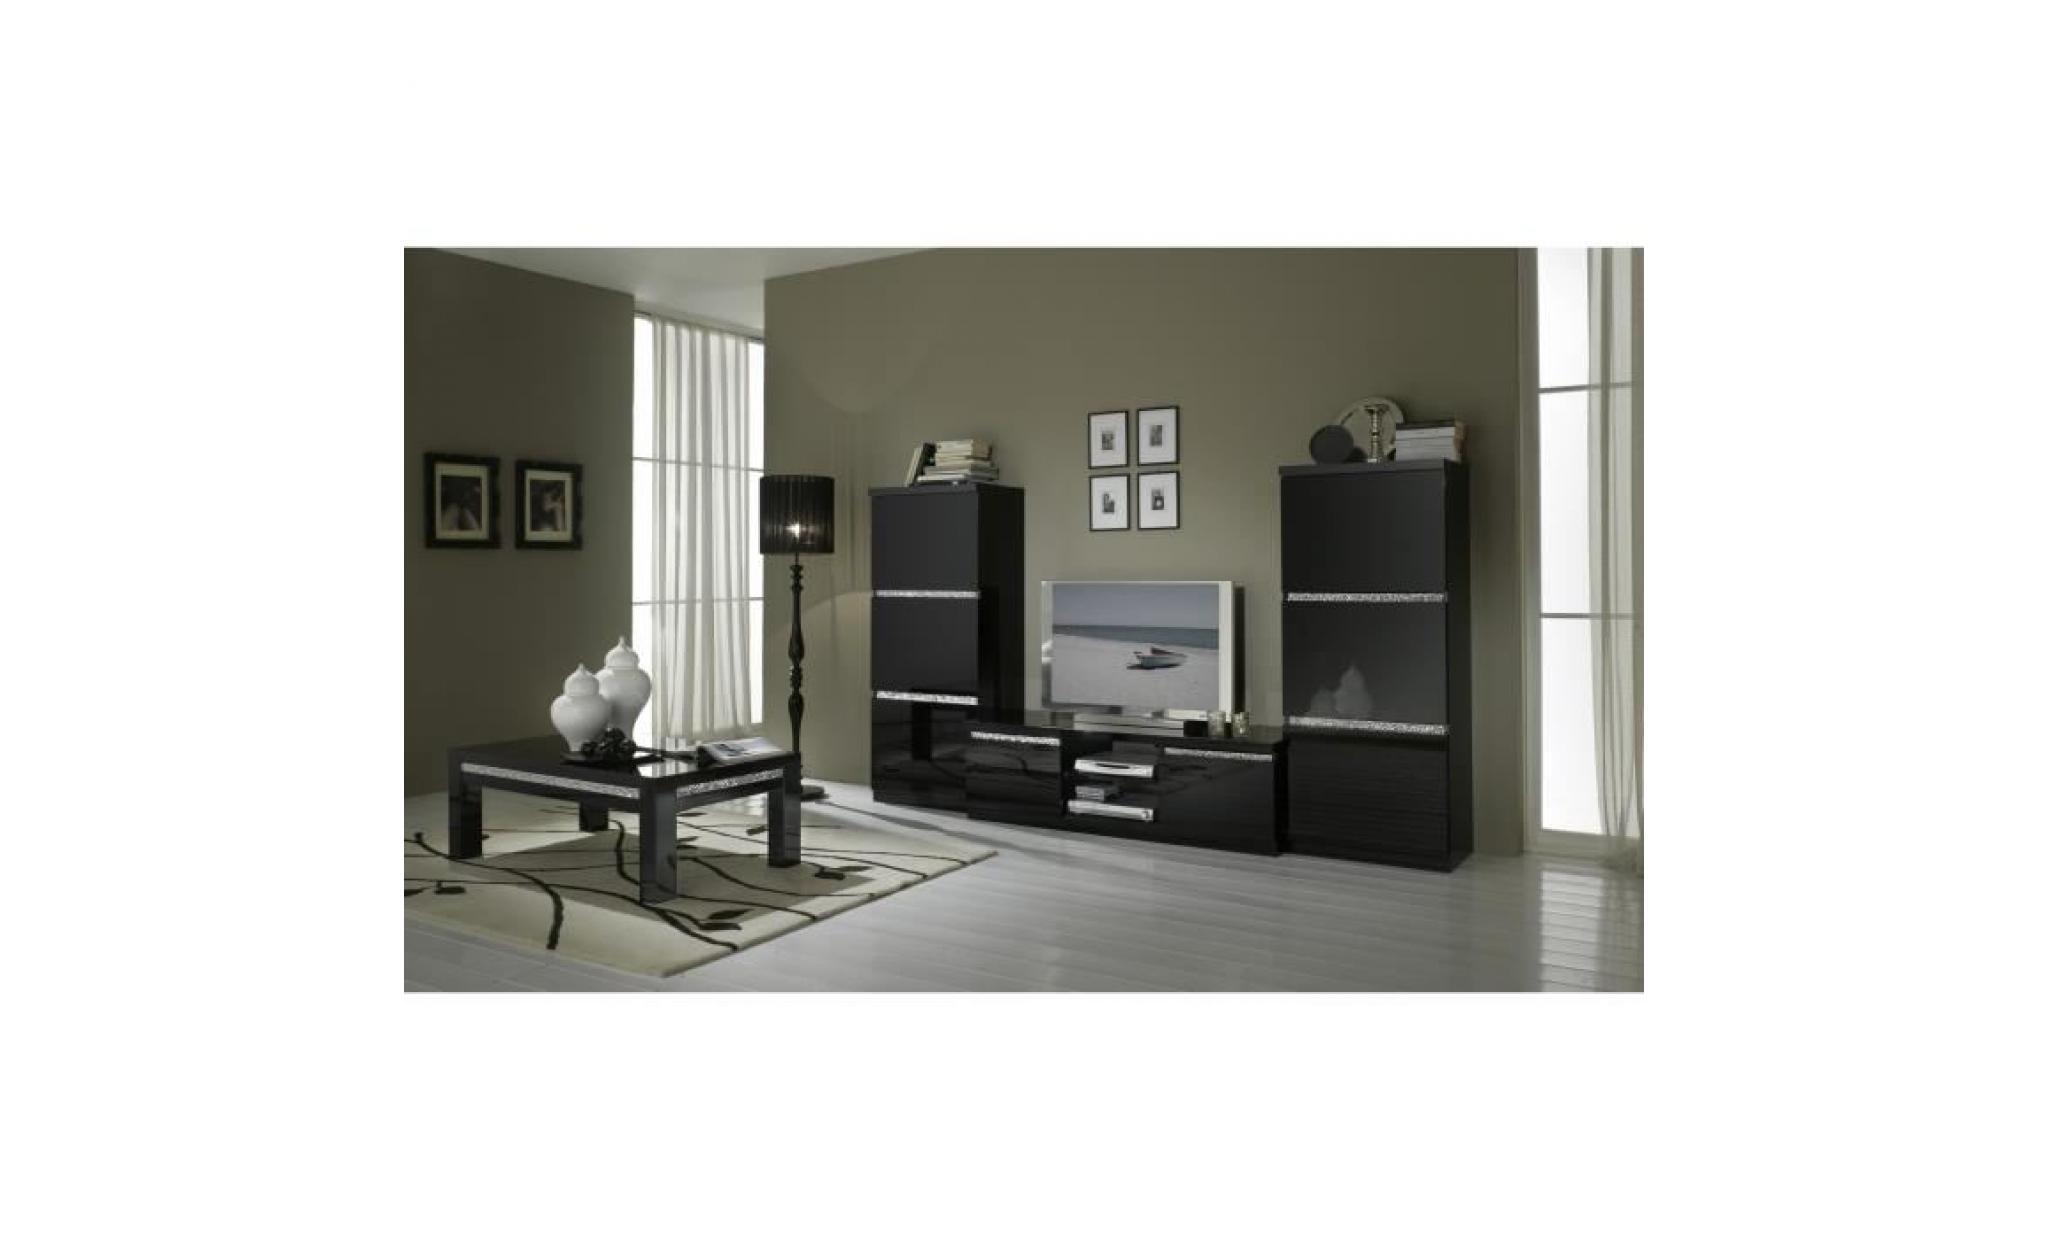 Meuble Tv Design Noir Laqu Garni De Cristaux Achat Vente Meuble  # Meuble Tv Design Noir Laque